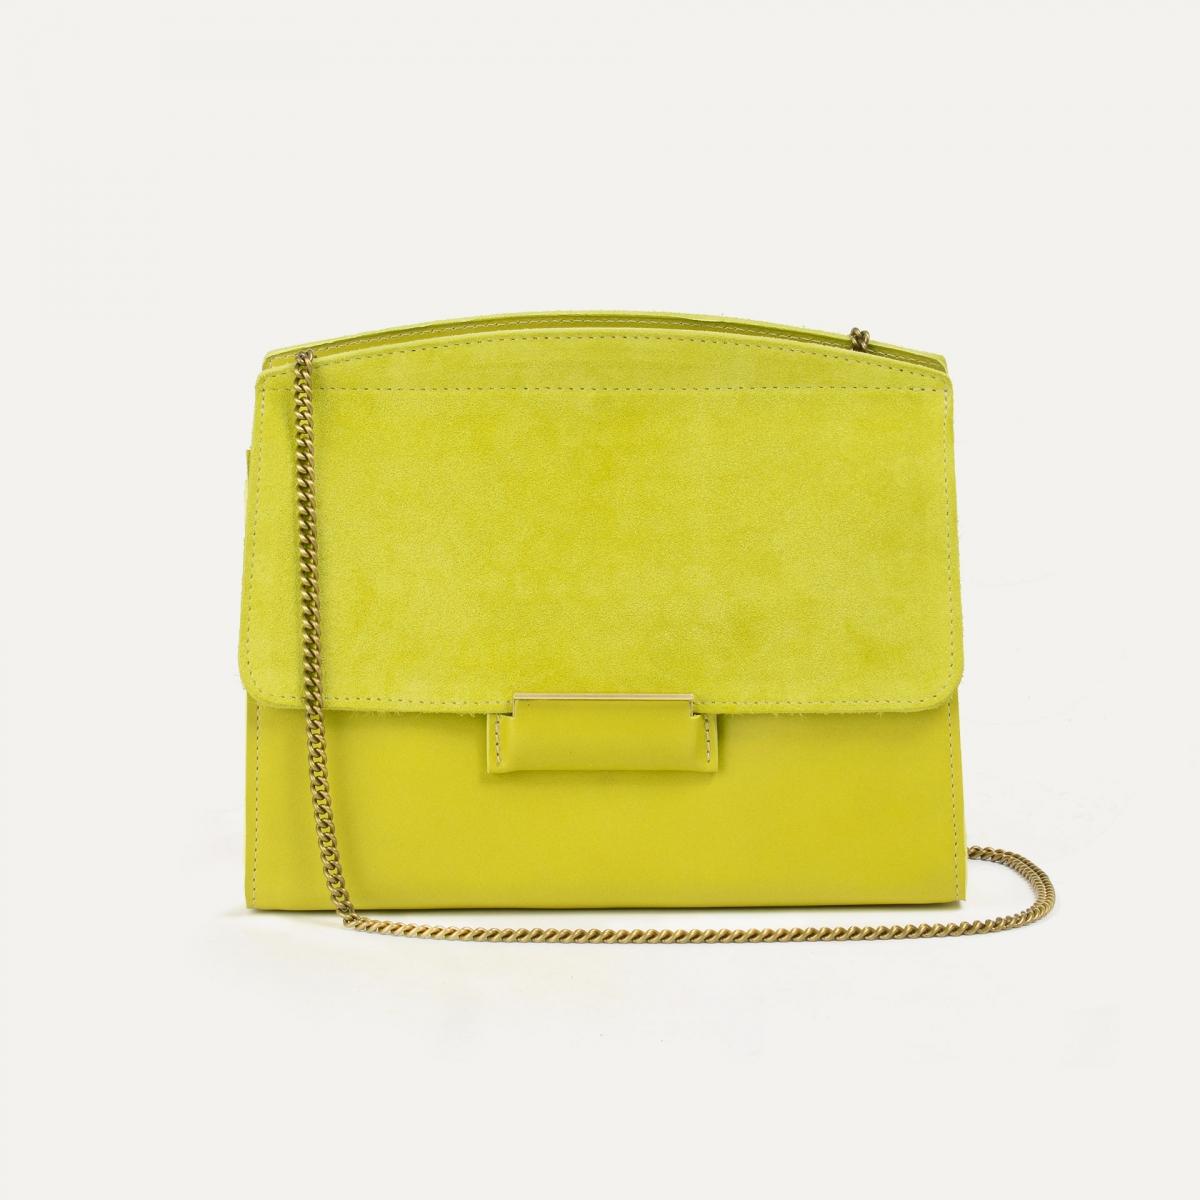 Origami S clutch bag - Bergamot (image n°2)